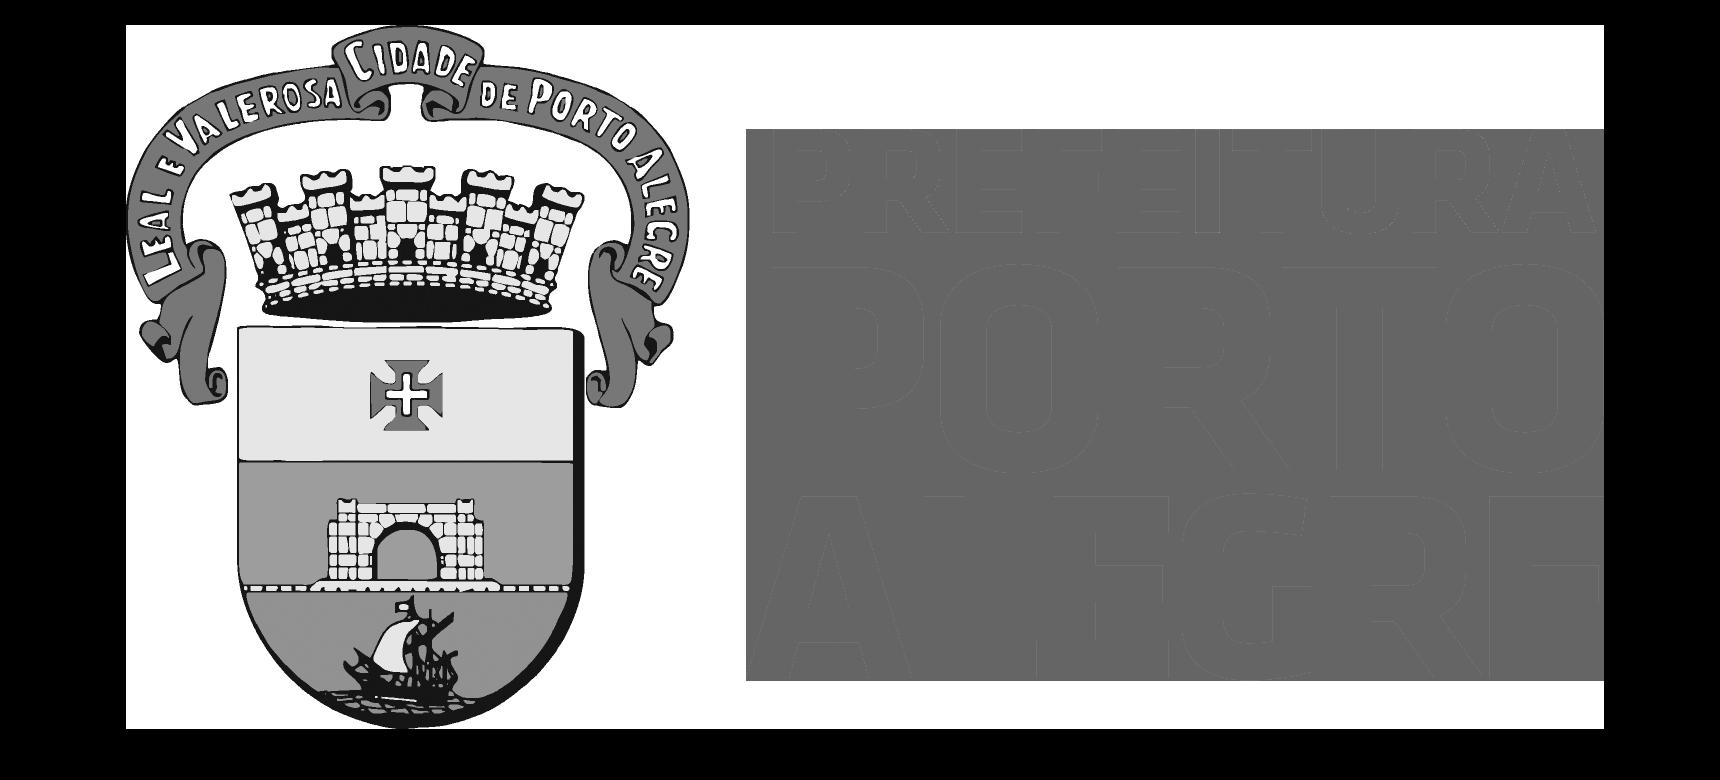 PortoAlegre Logo